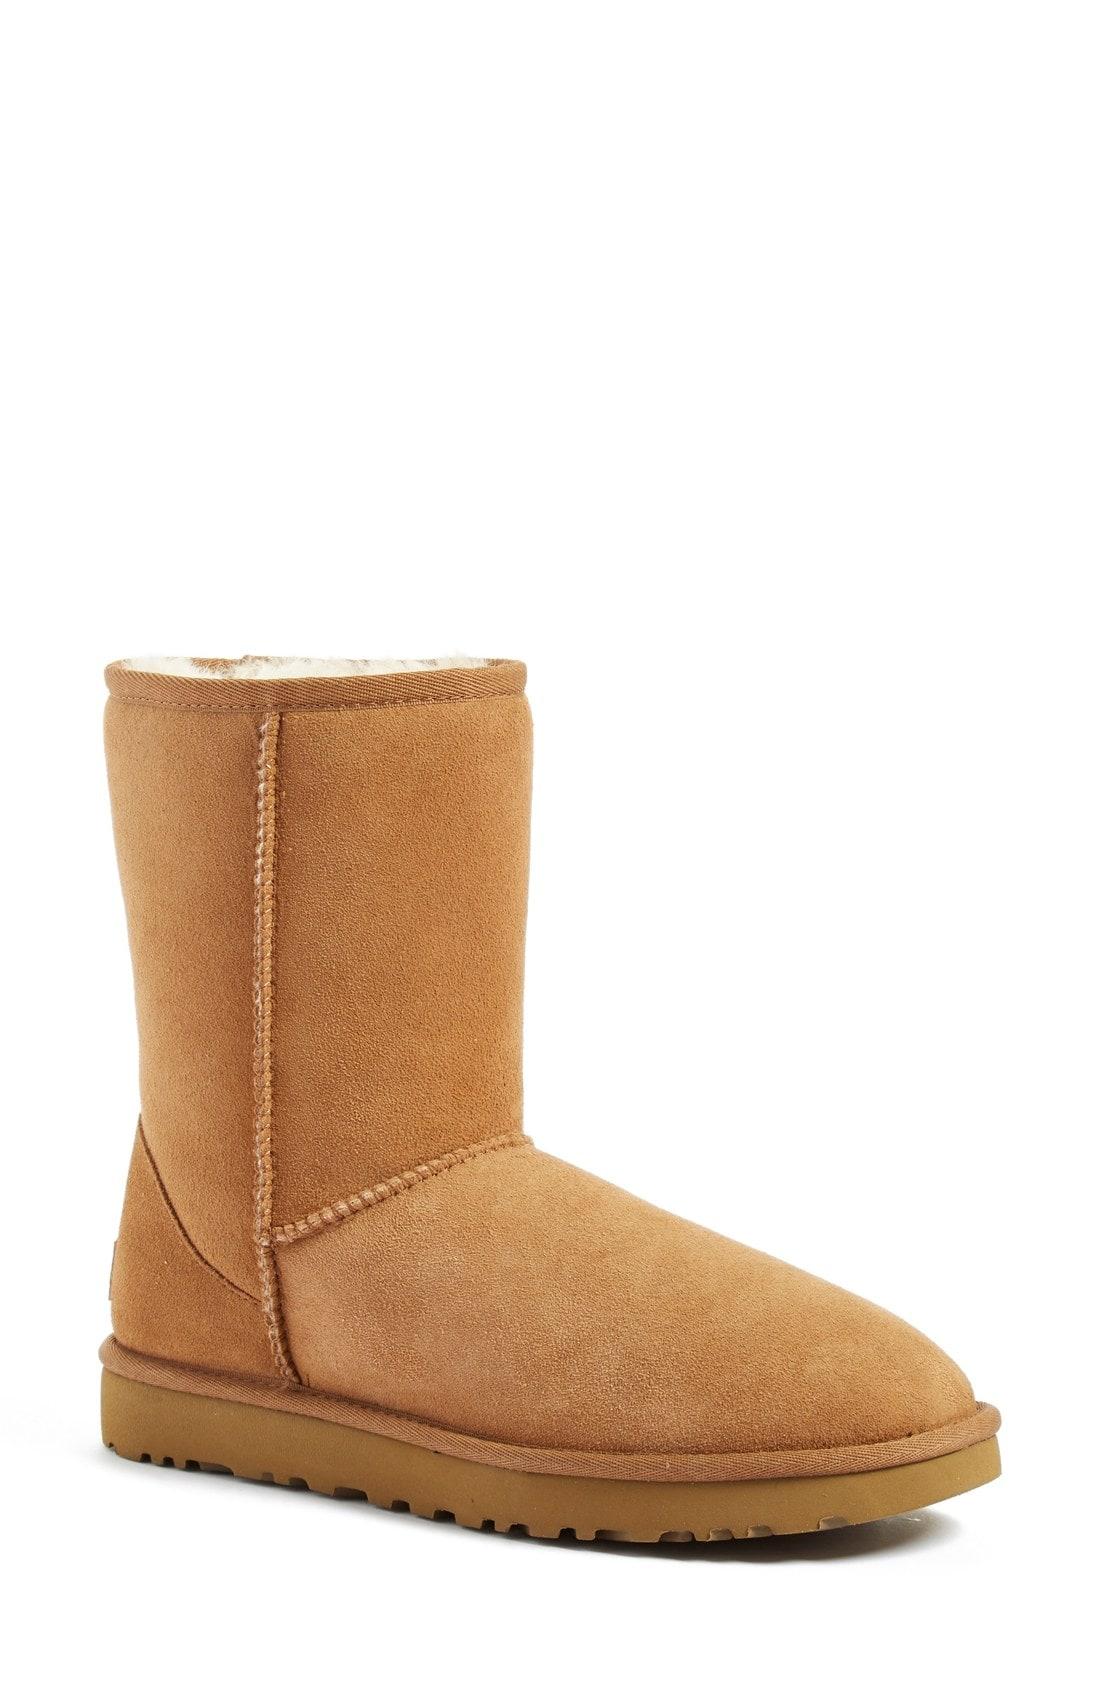 Women's Winter & Snow Boots | Nordstrom